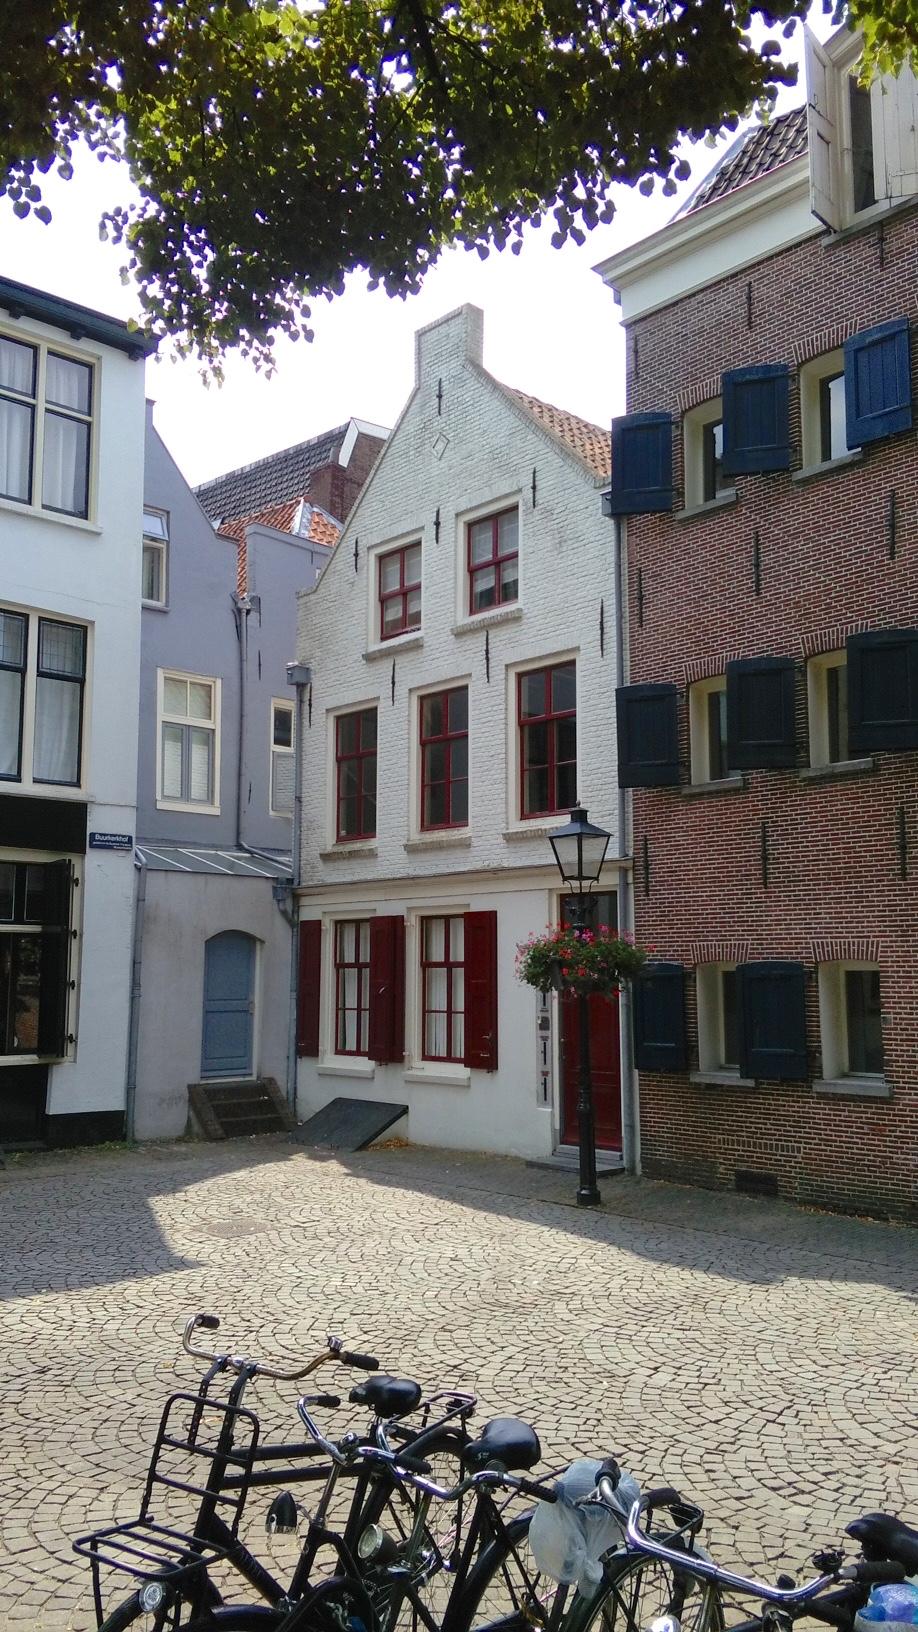 piazzetta nel centro di Utrecht